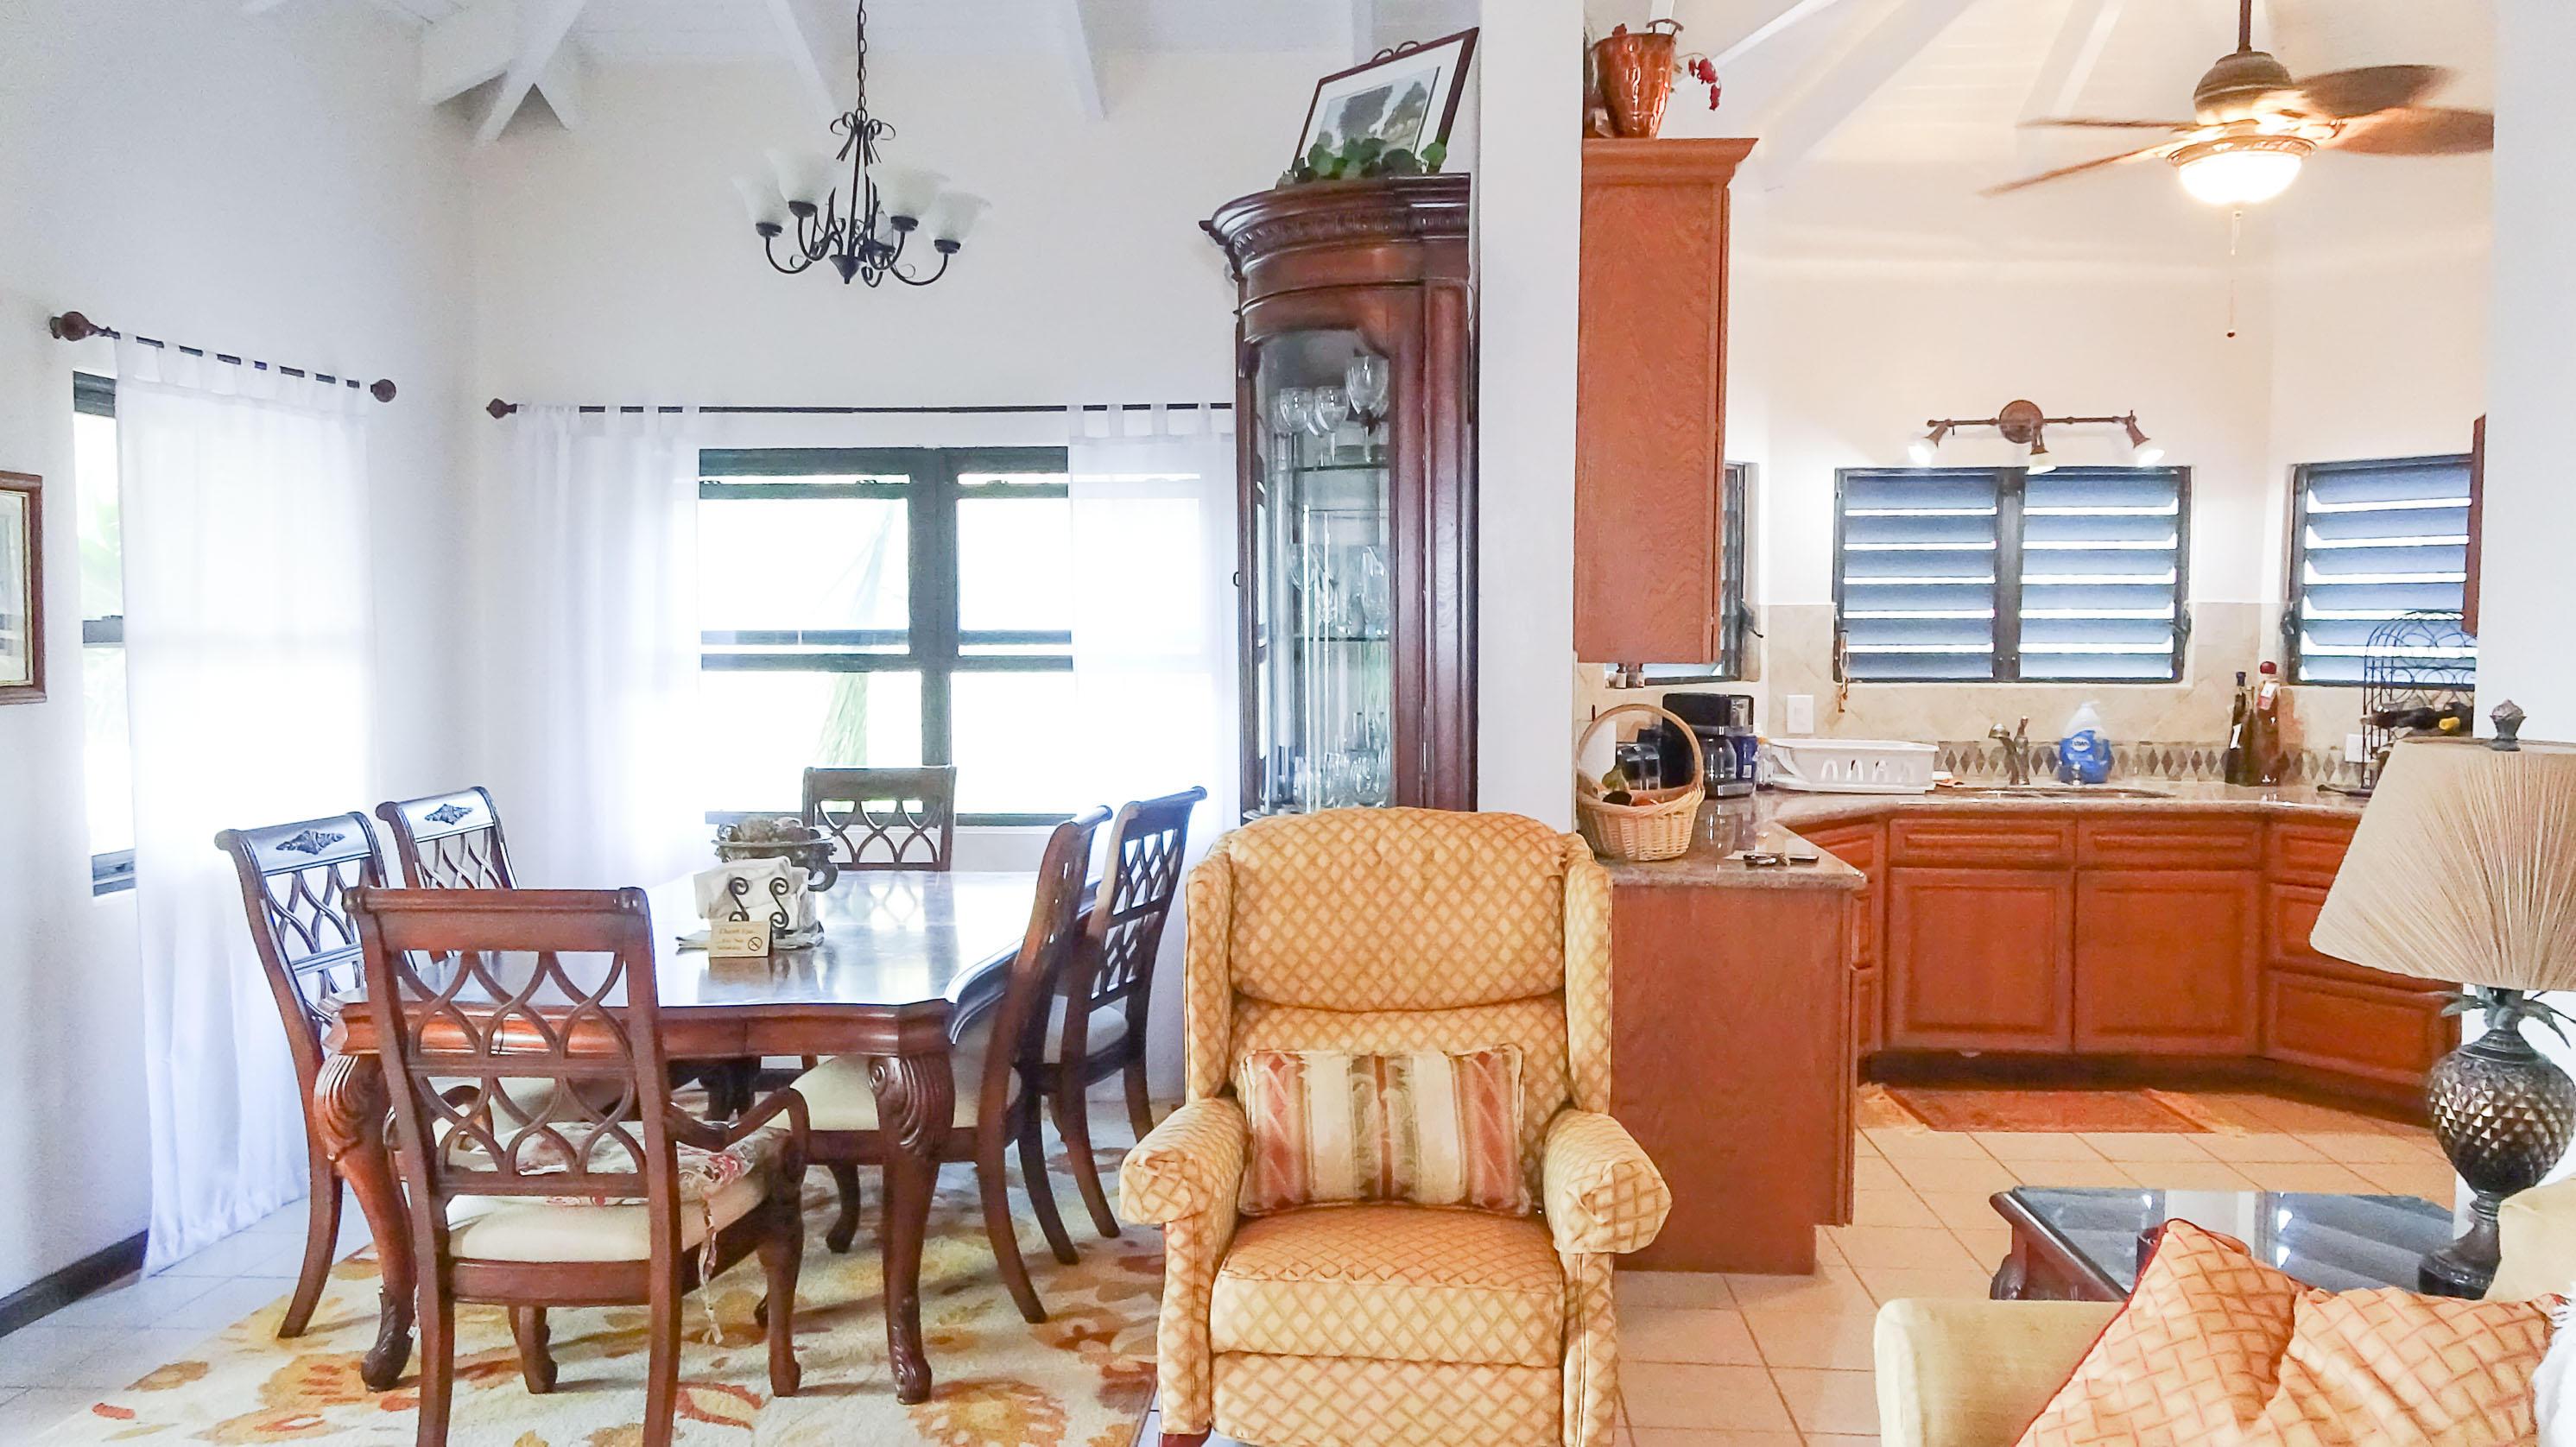 8-Dining Room Kitchen